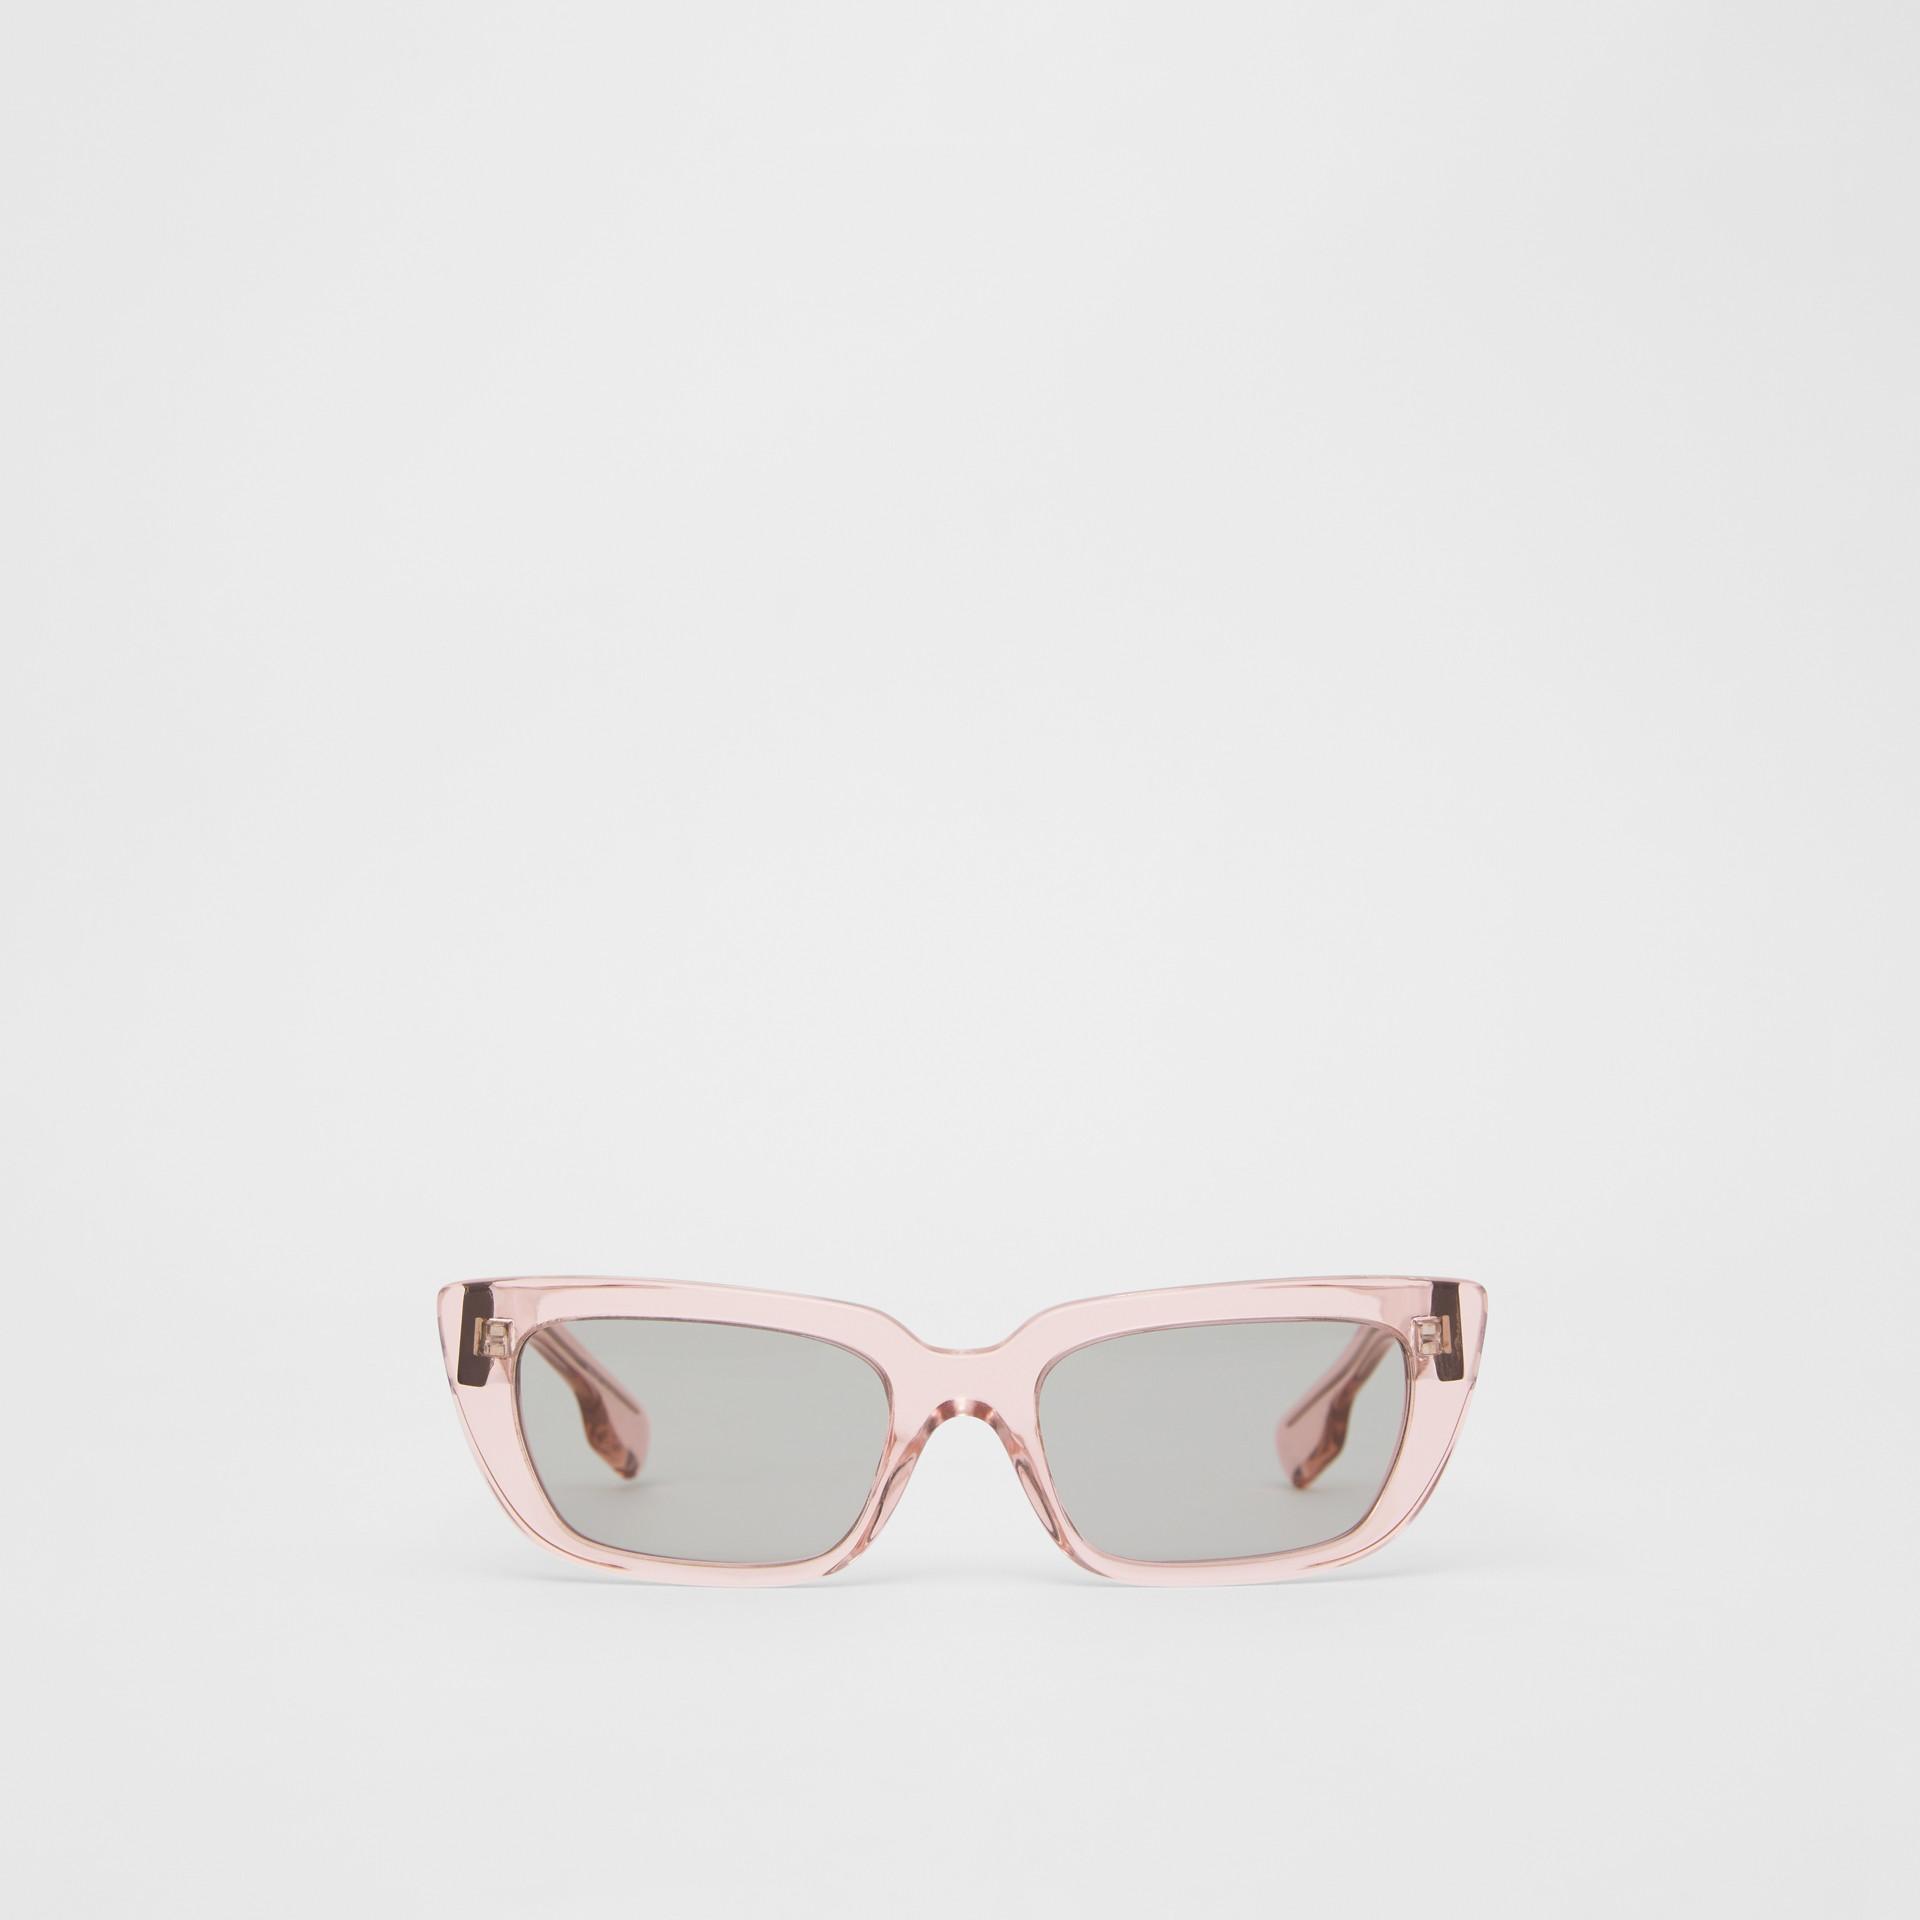 Bio-acetate Rectangular Frame Sunglasses in Light Pink - Women | Burberry - gallery image 0